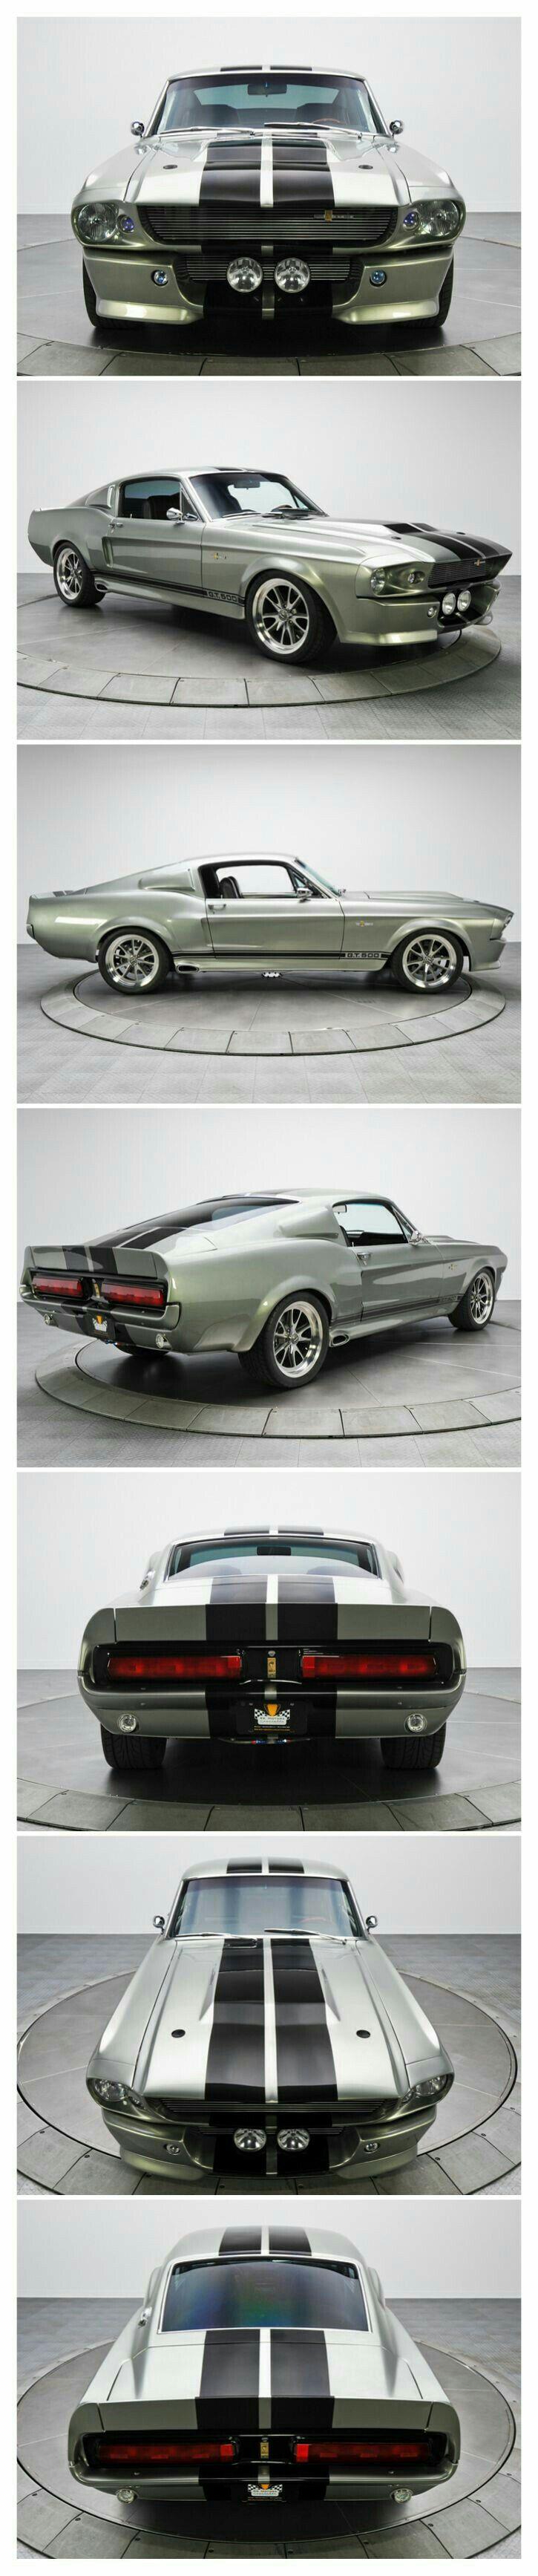 17 best car images on Pinterest